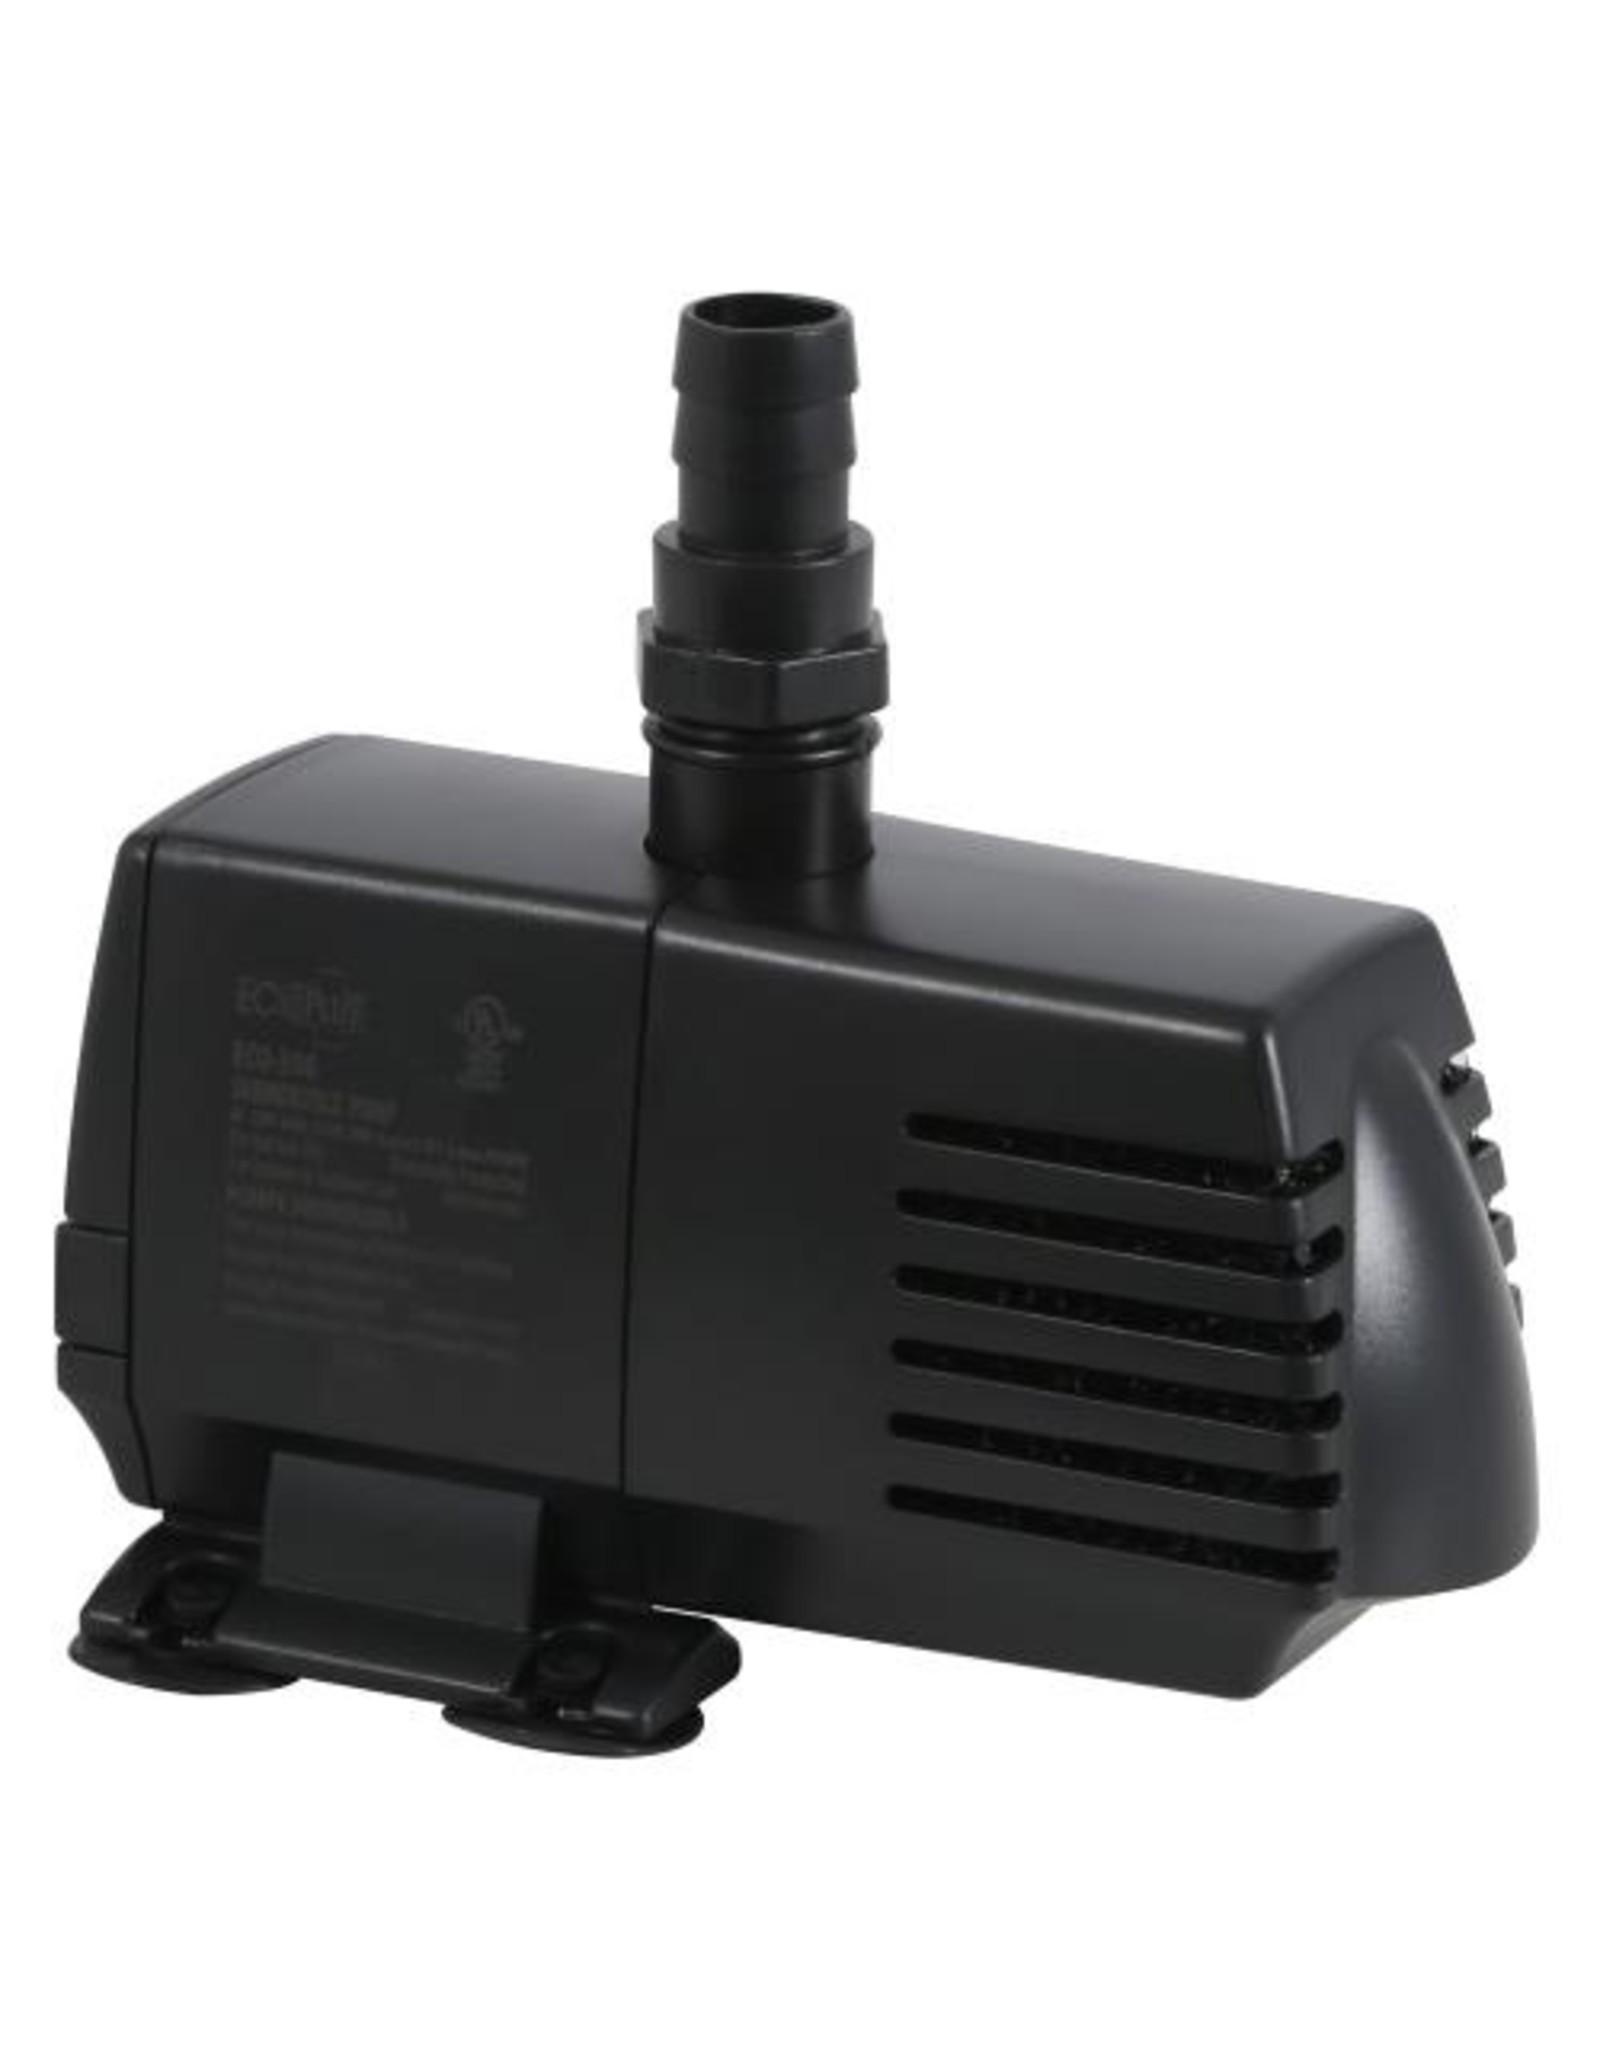 EcoPlus 396 Submersible Pump